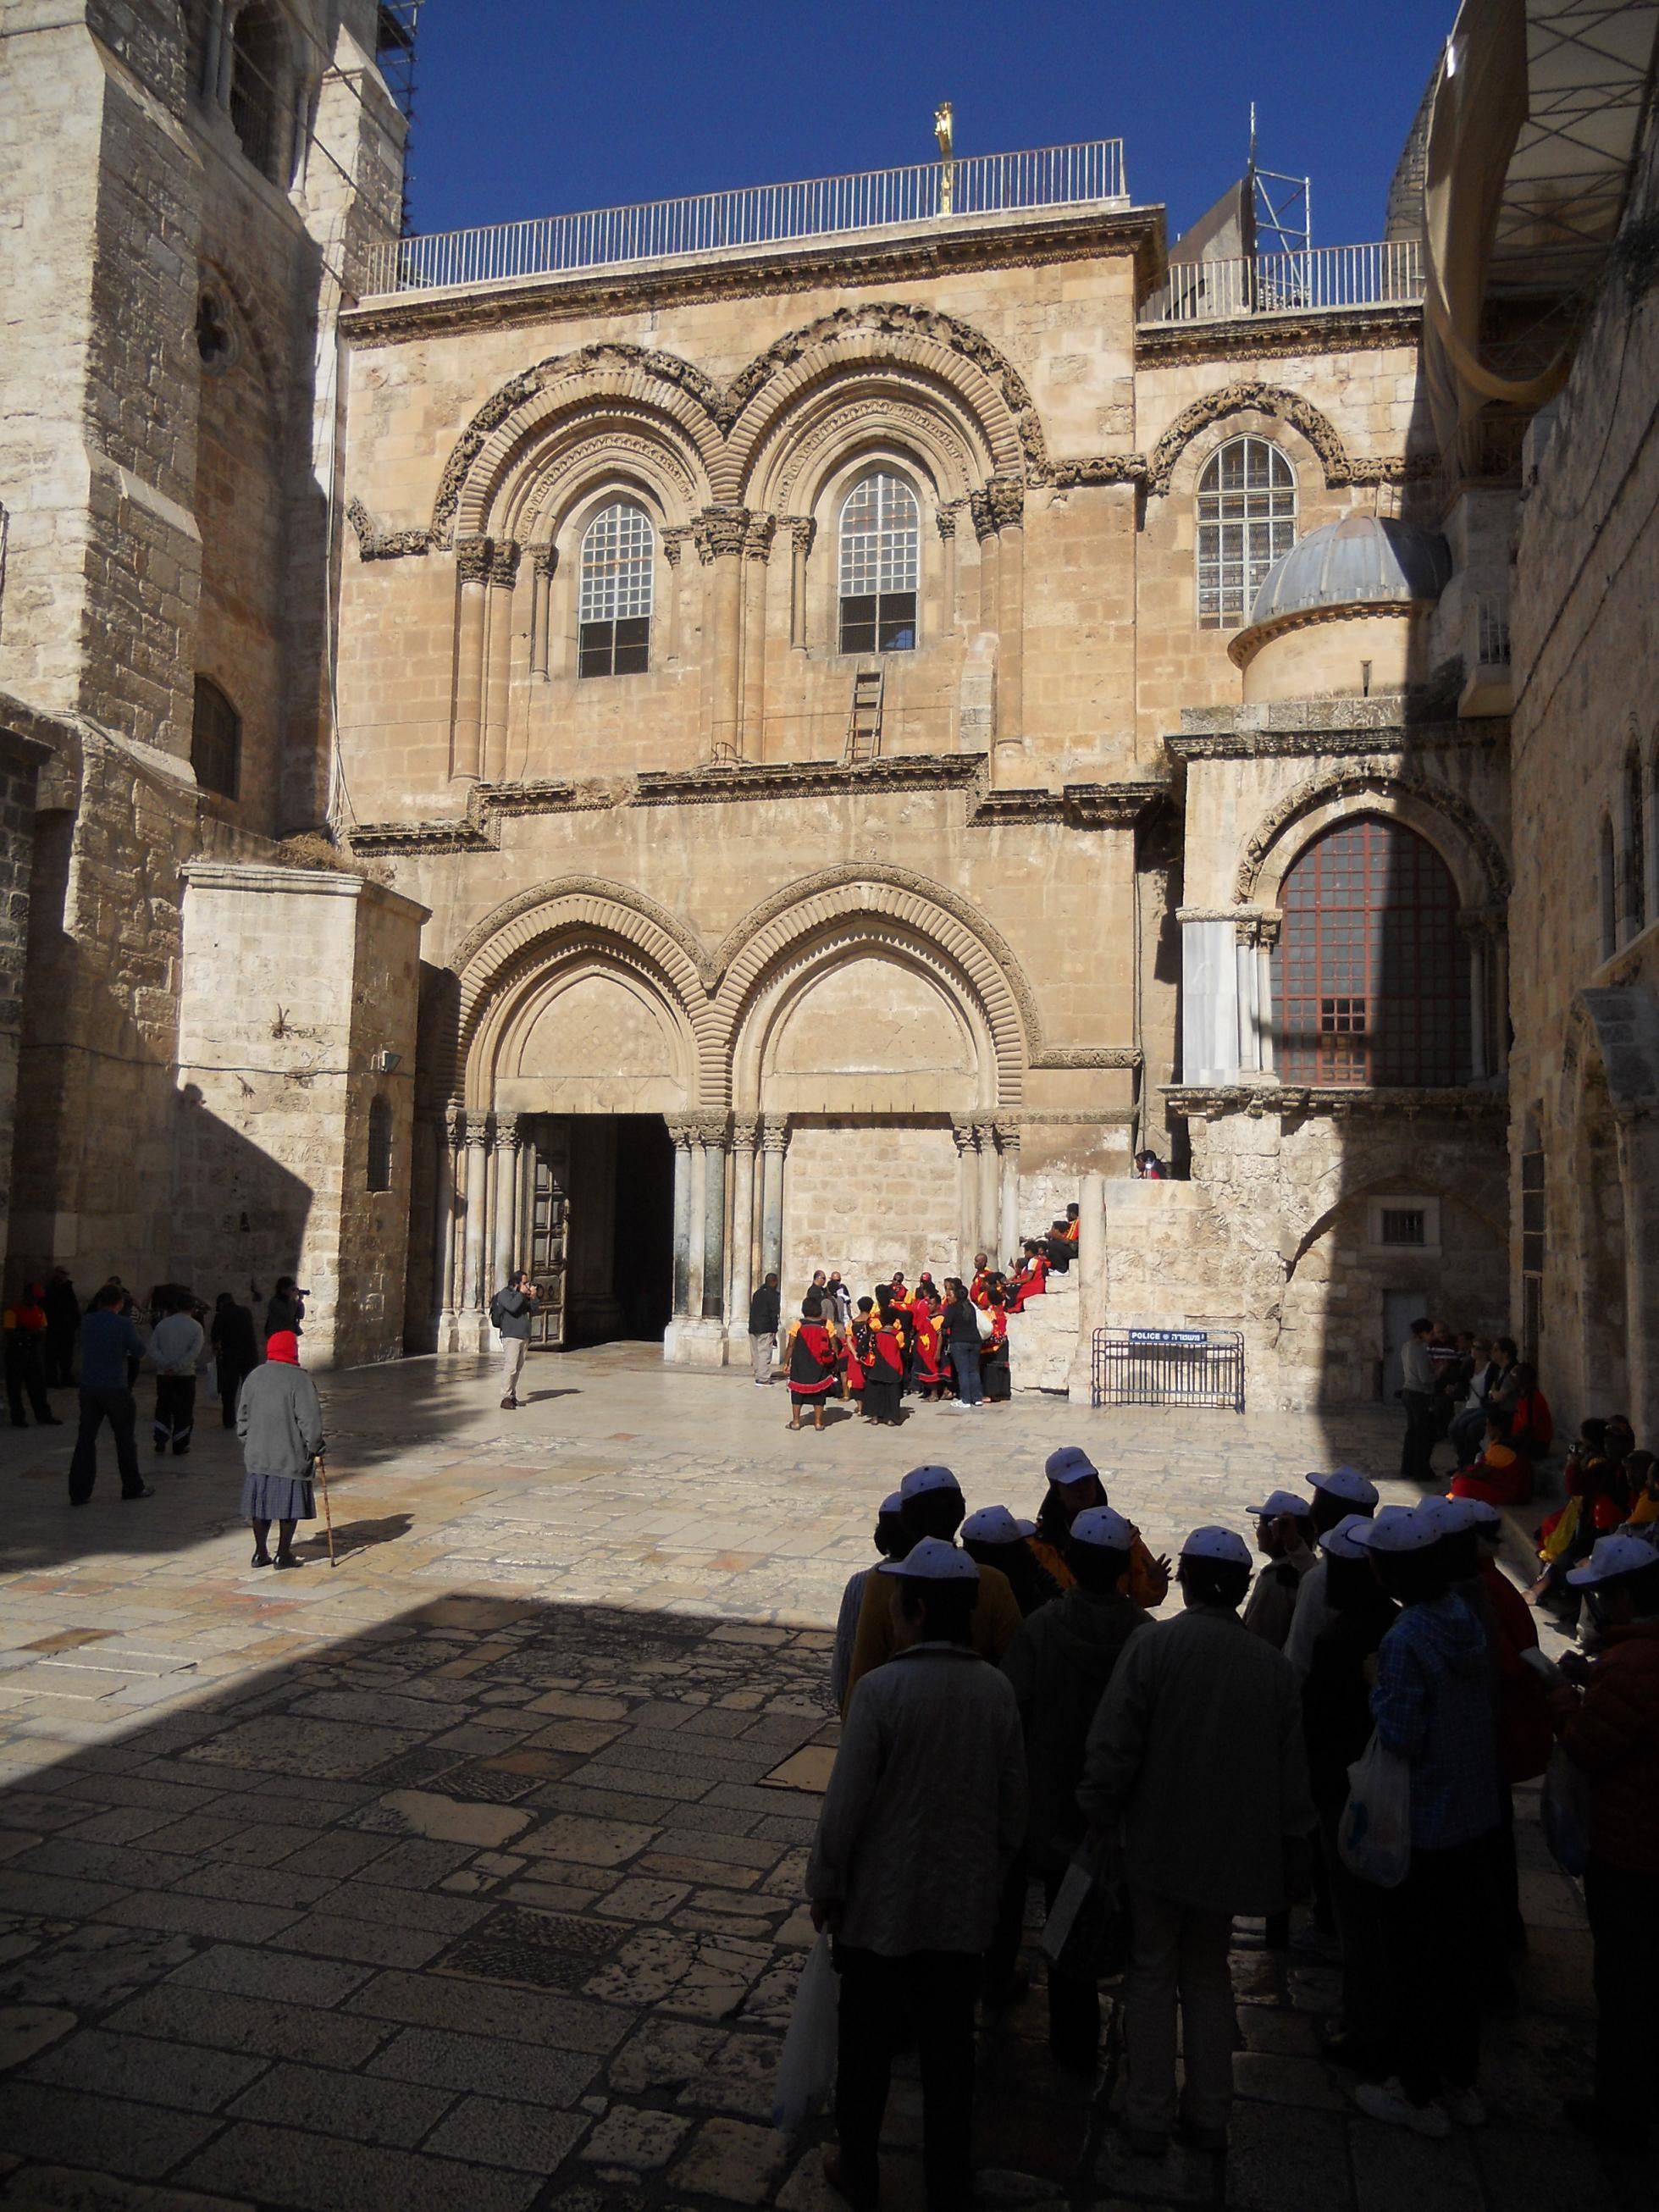 聖墳墓教会の画像 p1_28